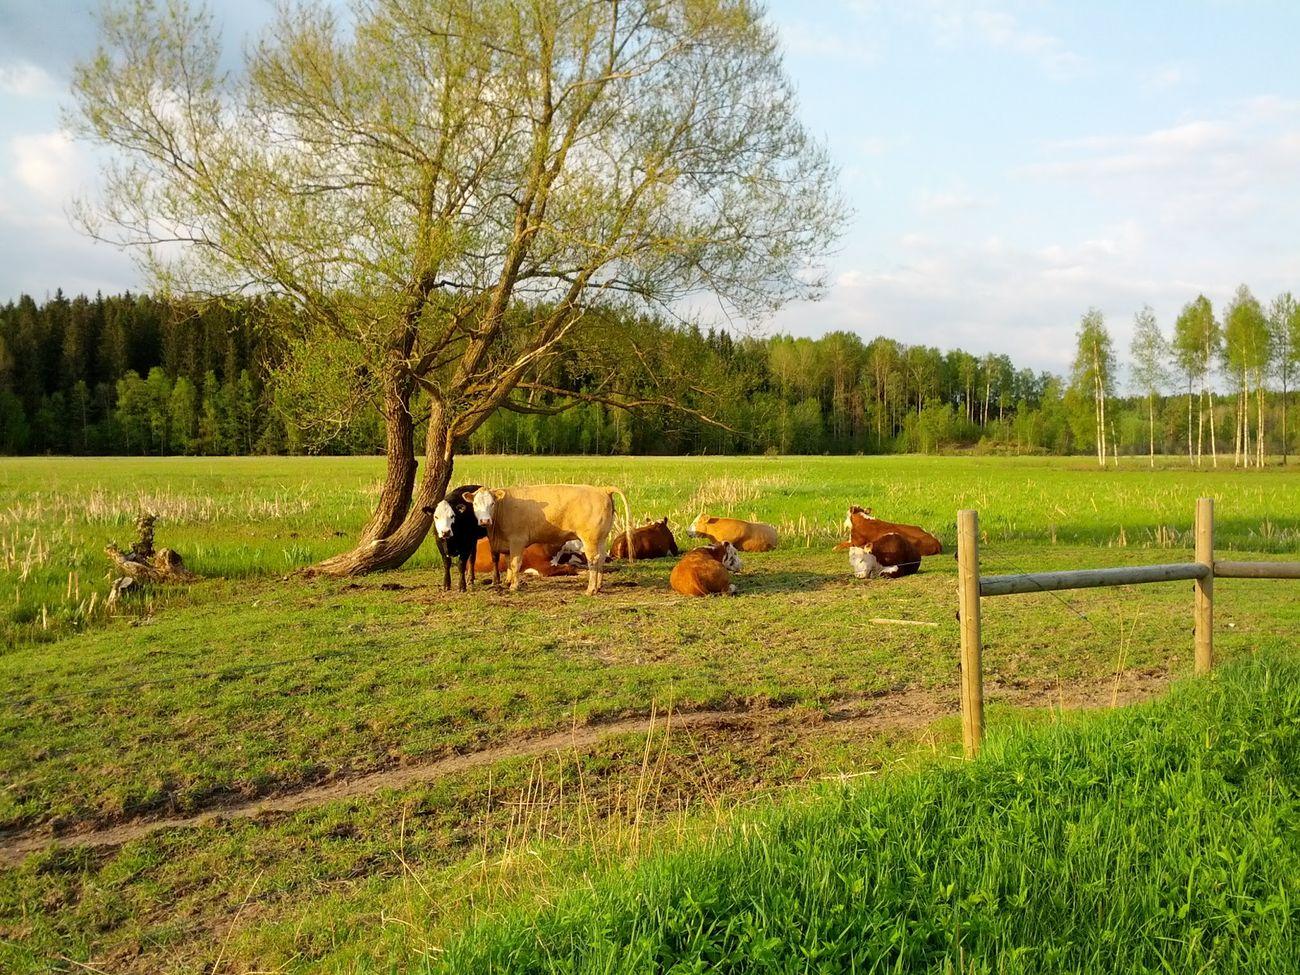 cows Cows Muuuu